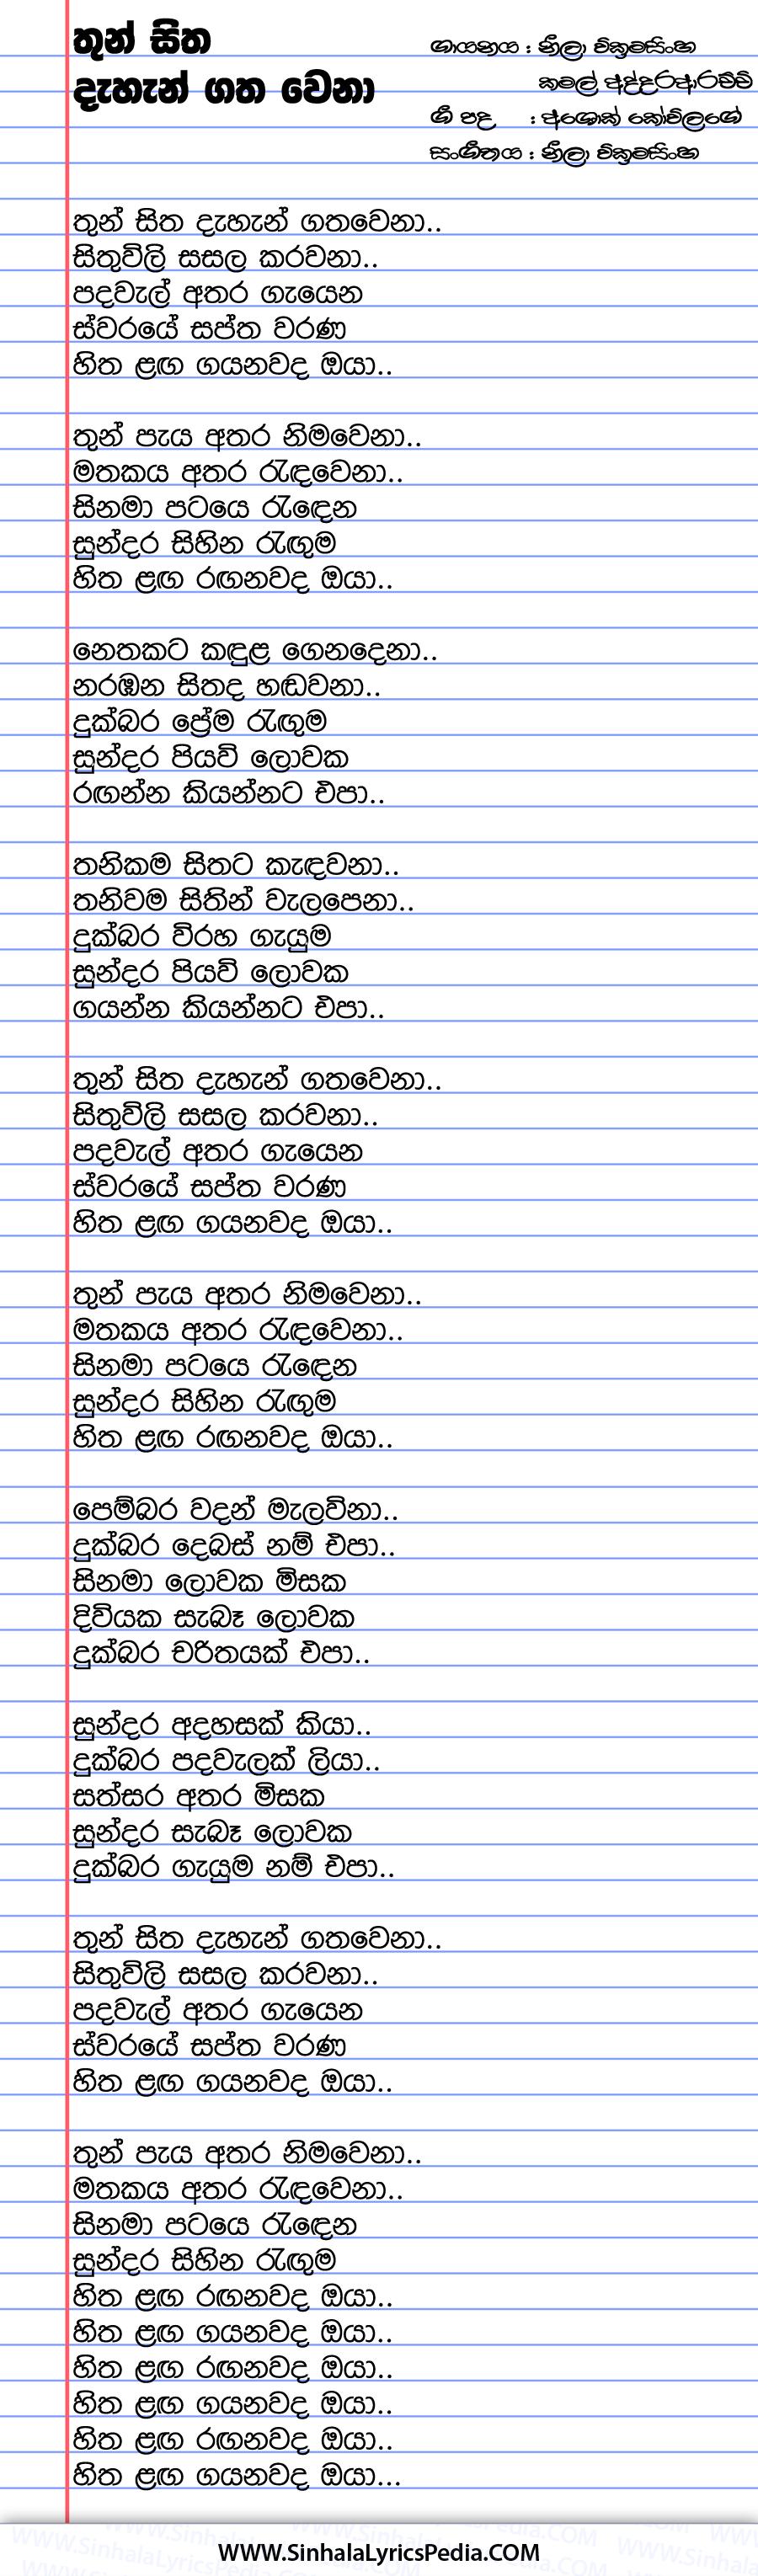 Thun Sitha Dahan Gatha Wena Song Lyrics